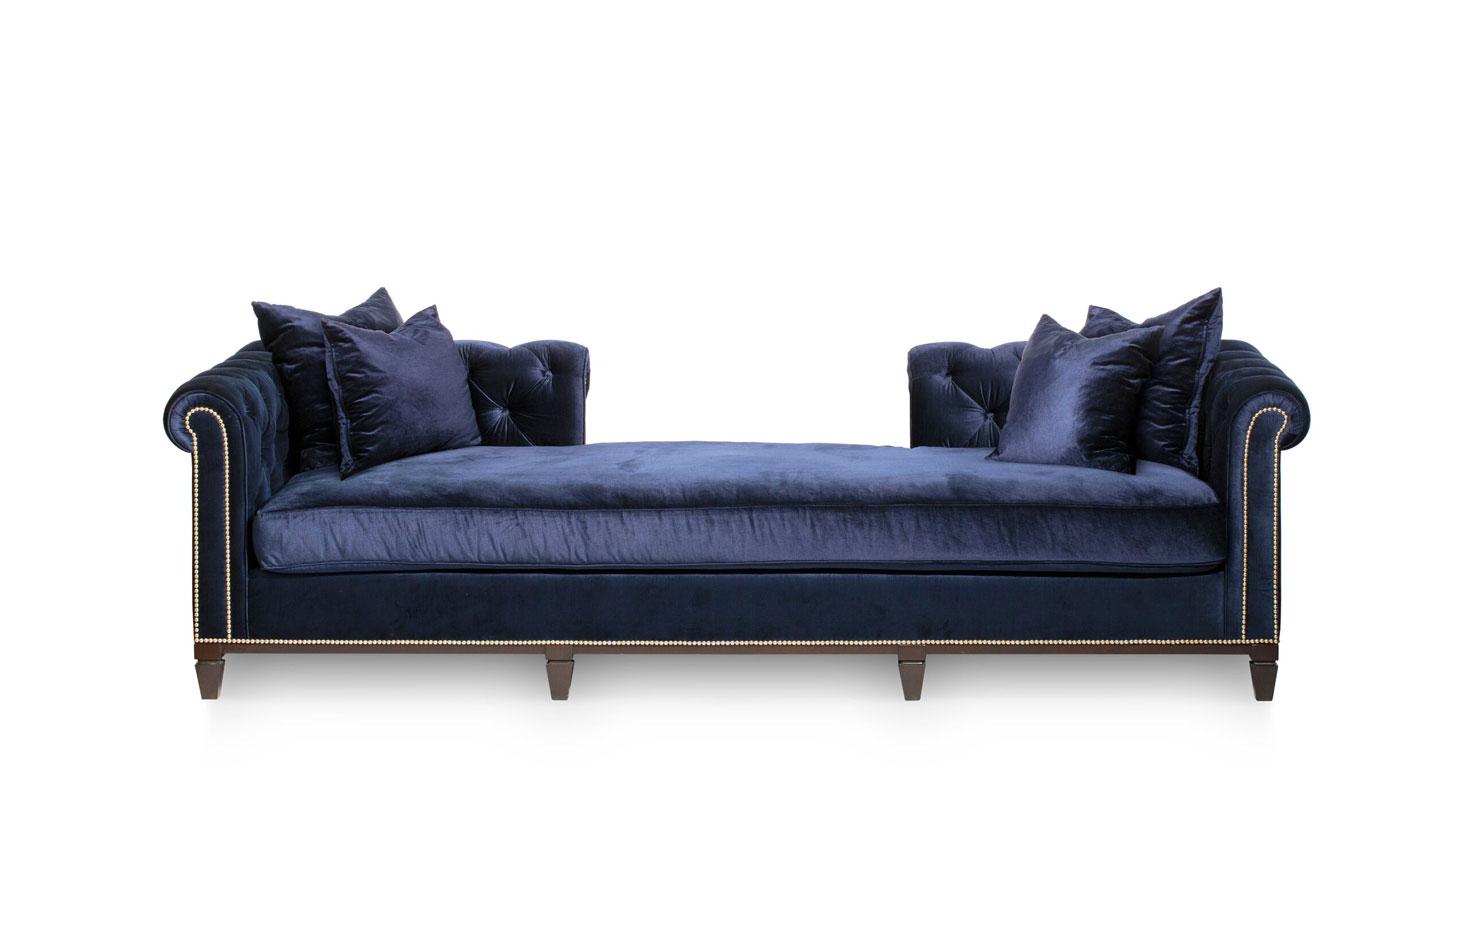 wedgewood-sofa-01.jpg